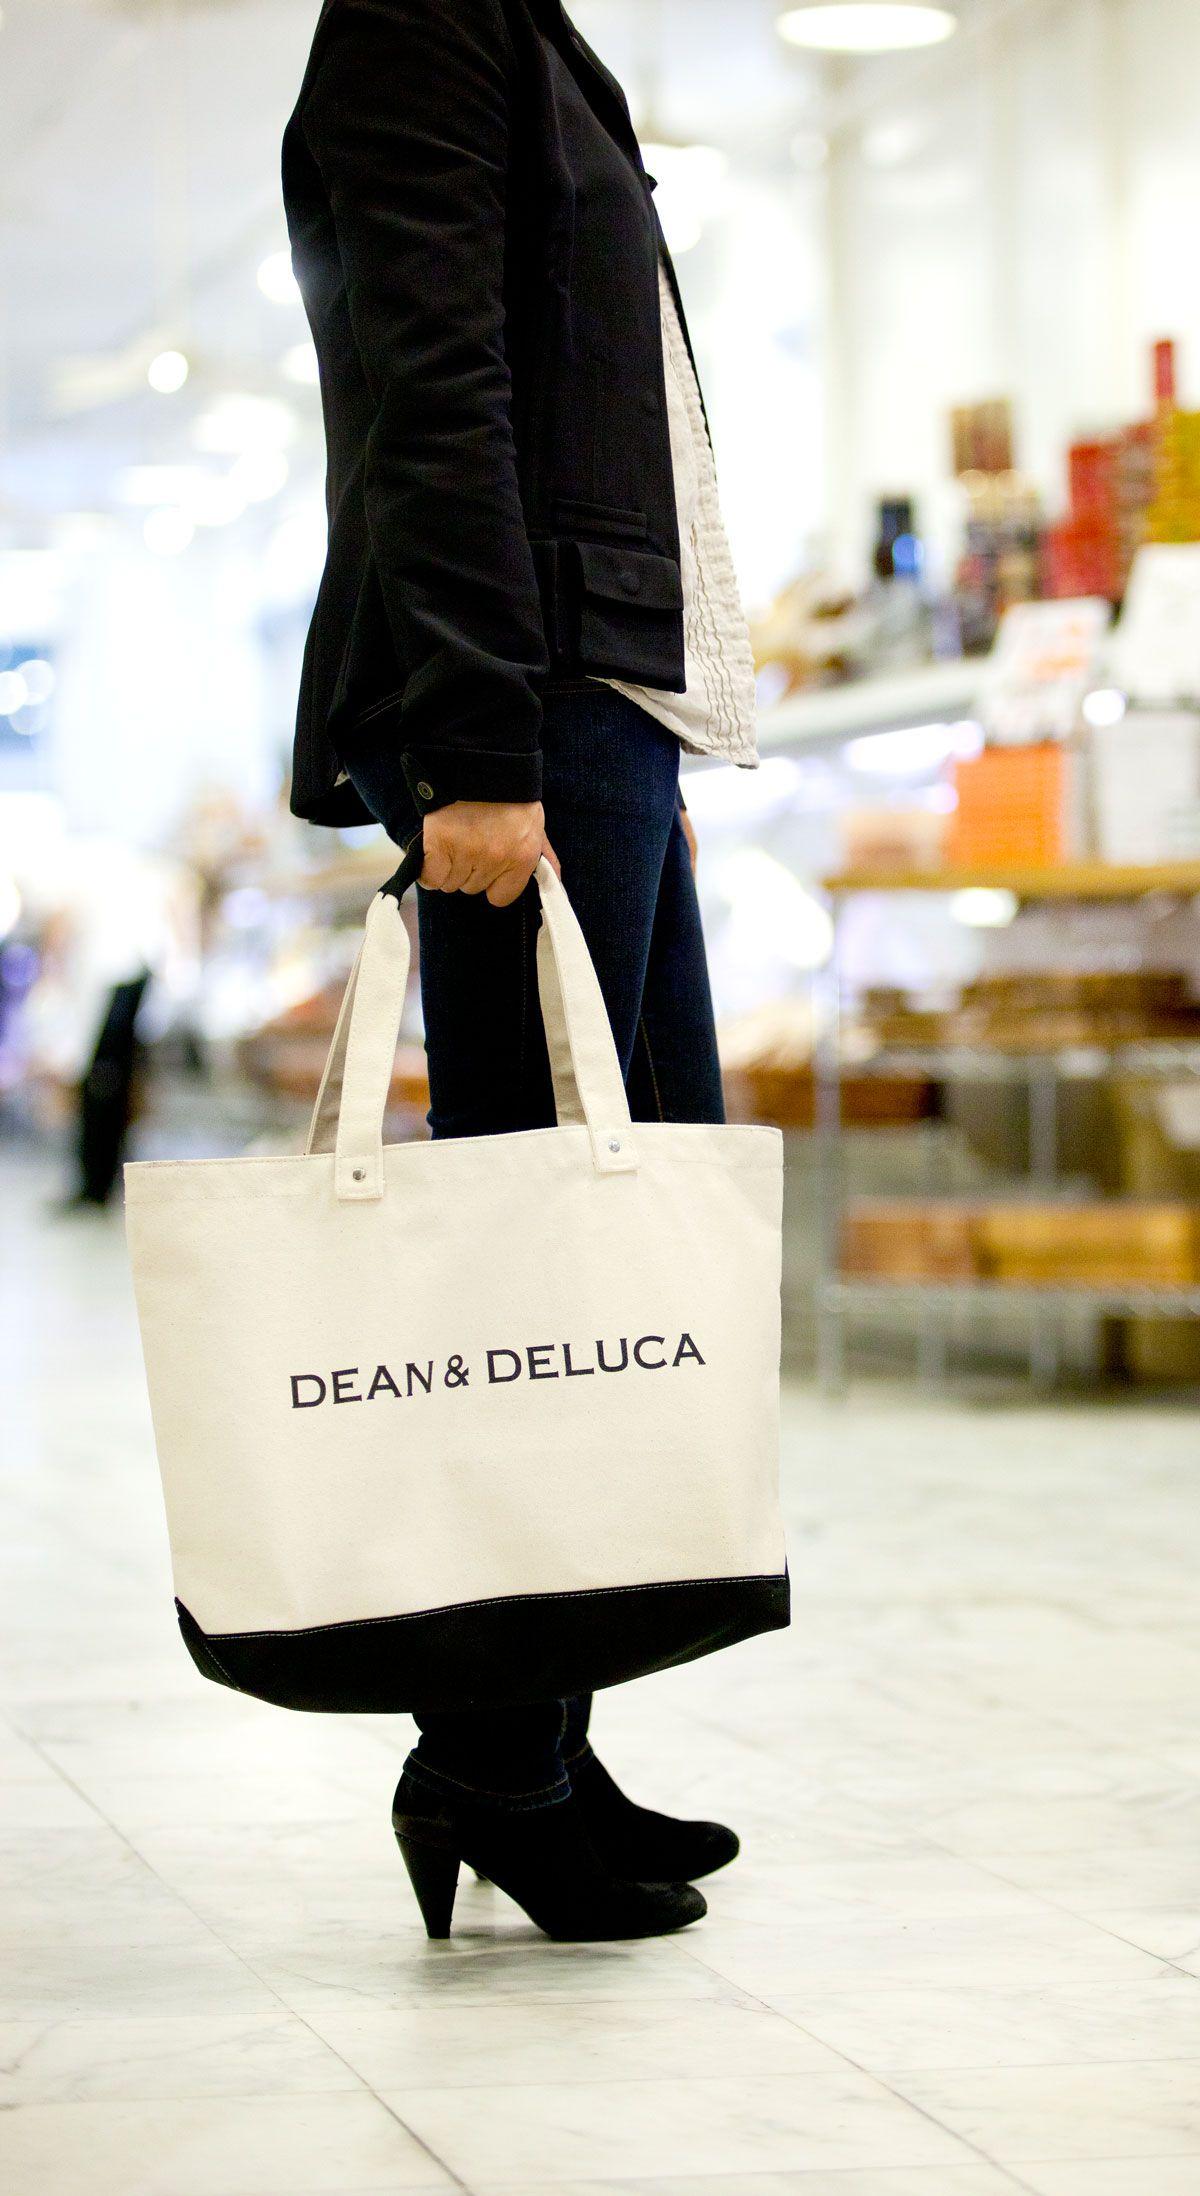 Dean Amp Deluca Soho Fashion Never Fails To Appear Dean